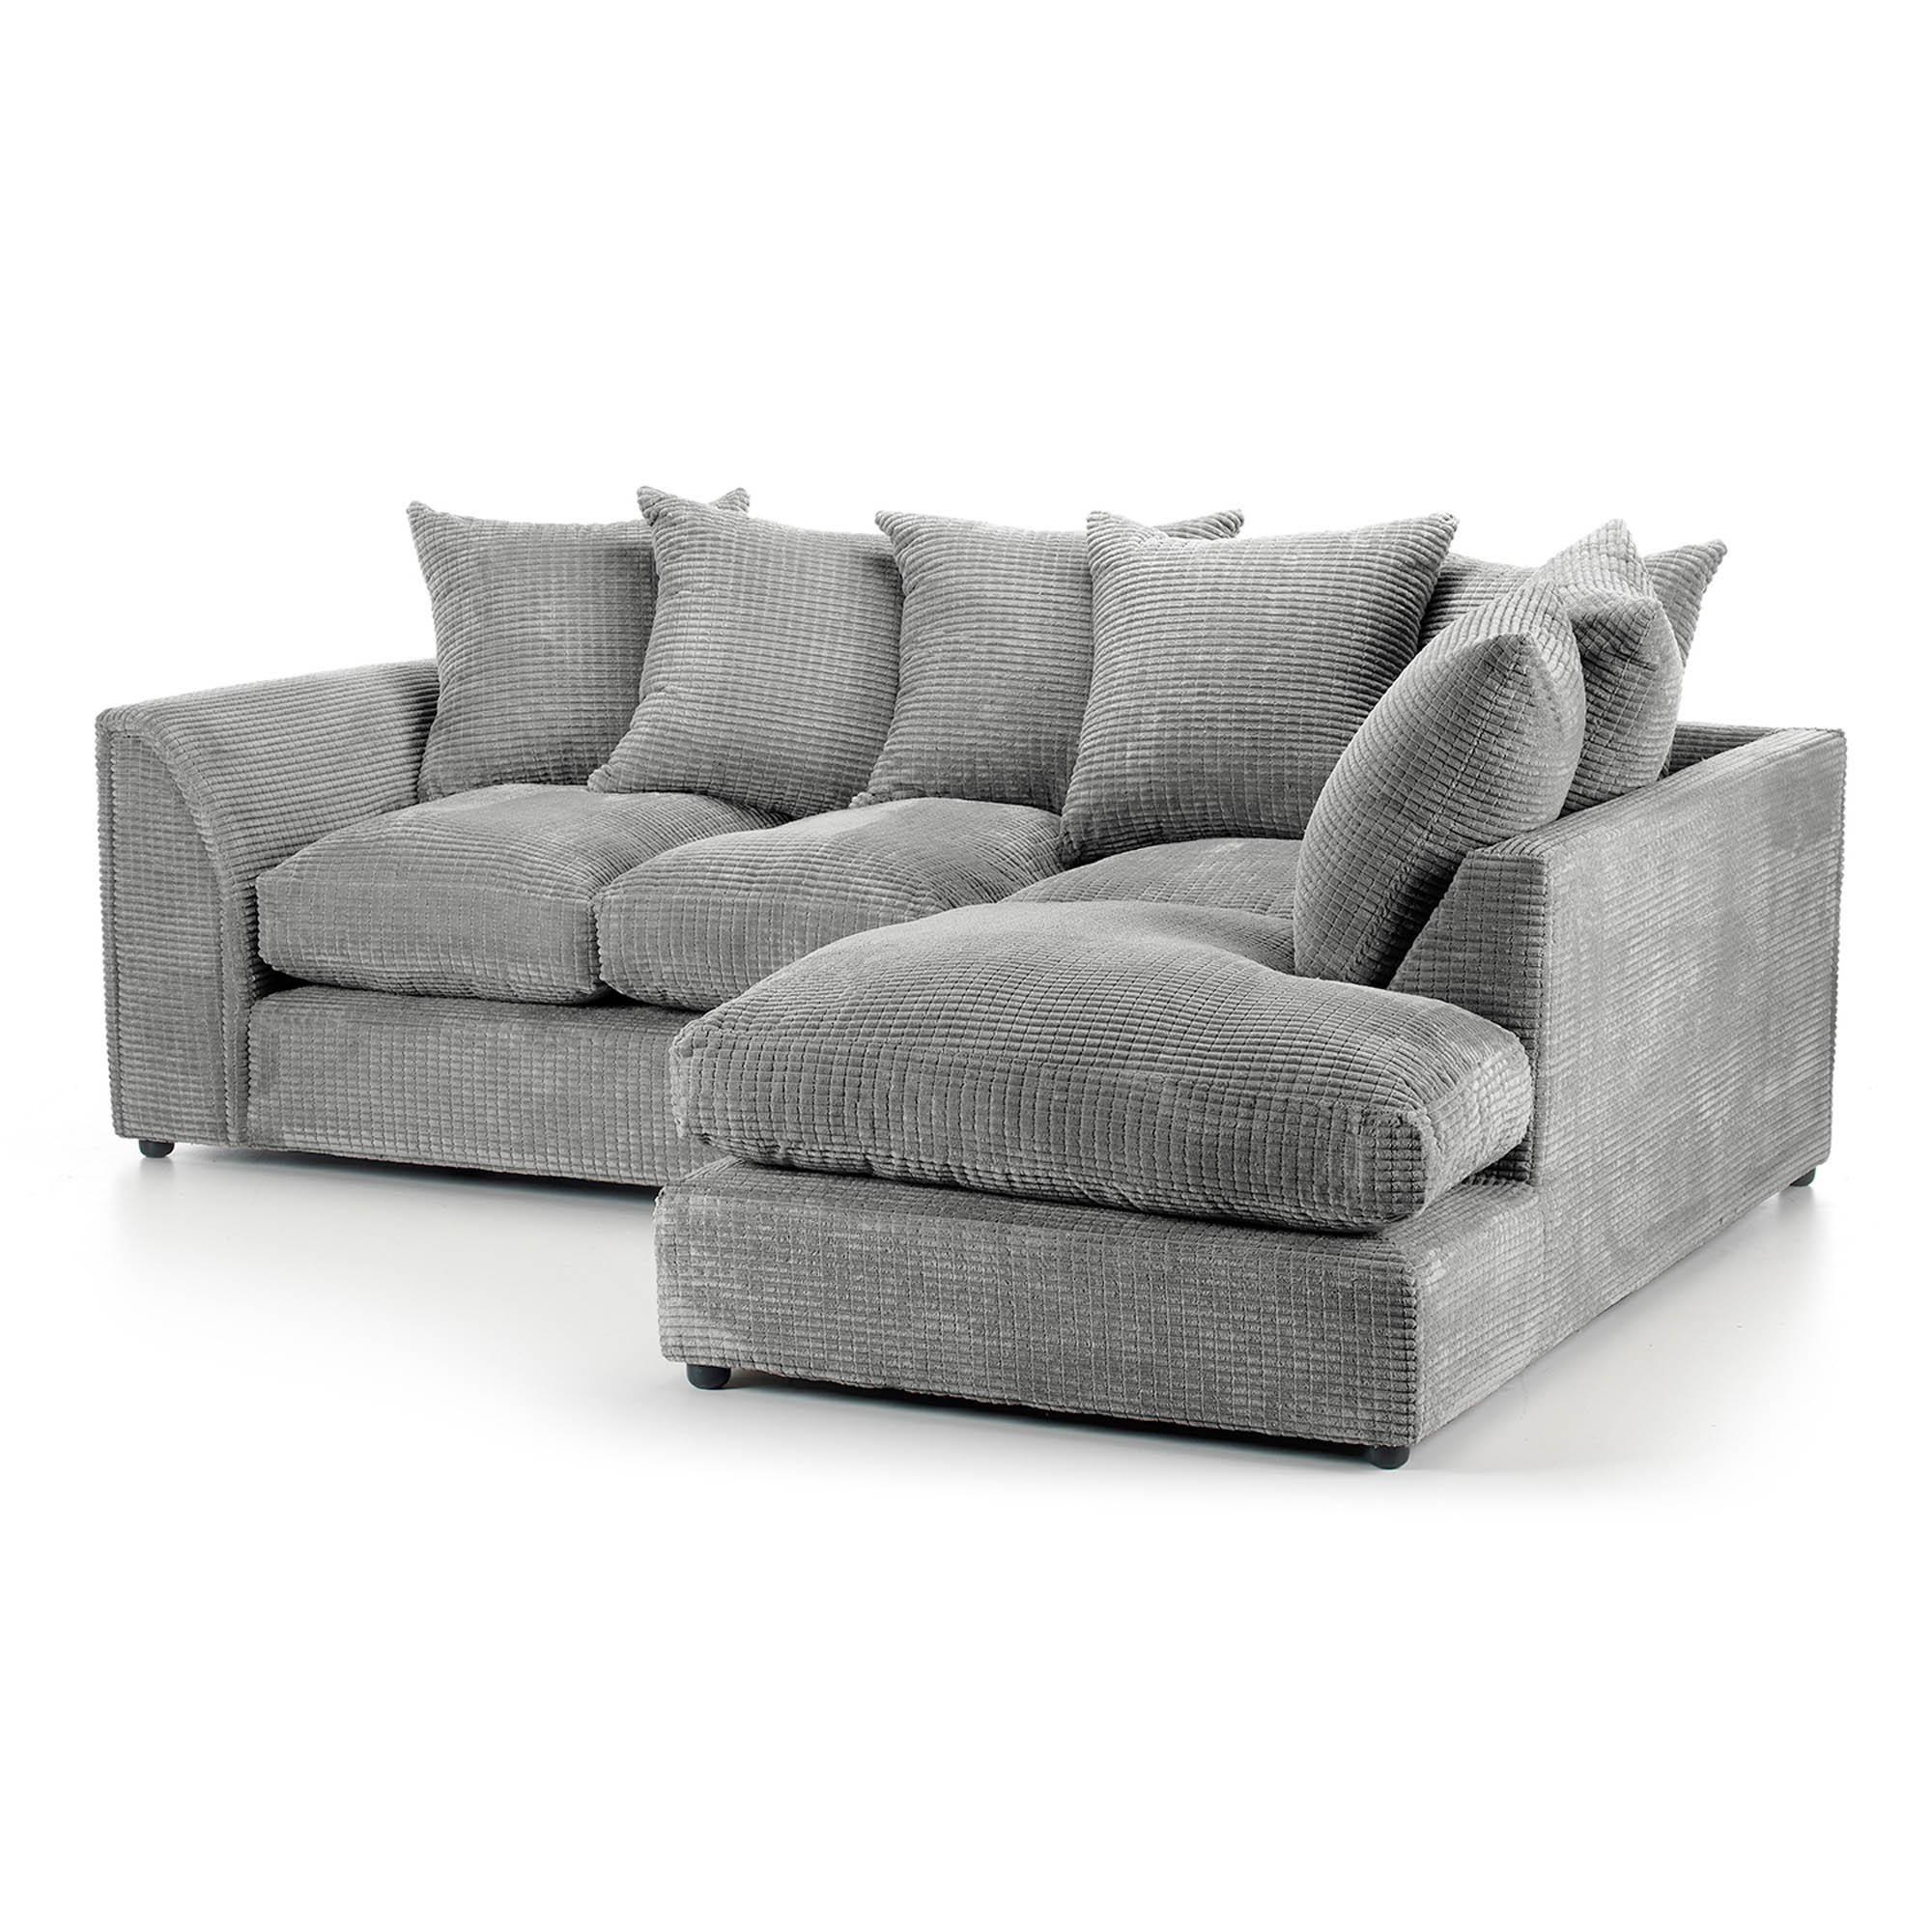 Denver Grey Right Hand Corner Sofa In 2020 Corner Sofa Corner Sofa Next Sofa